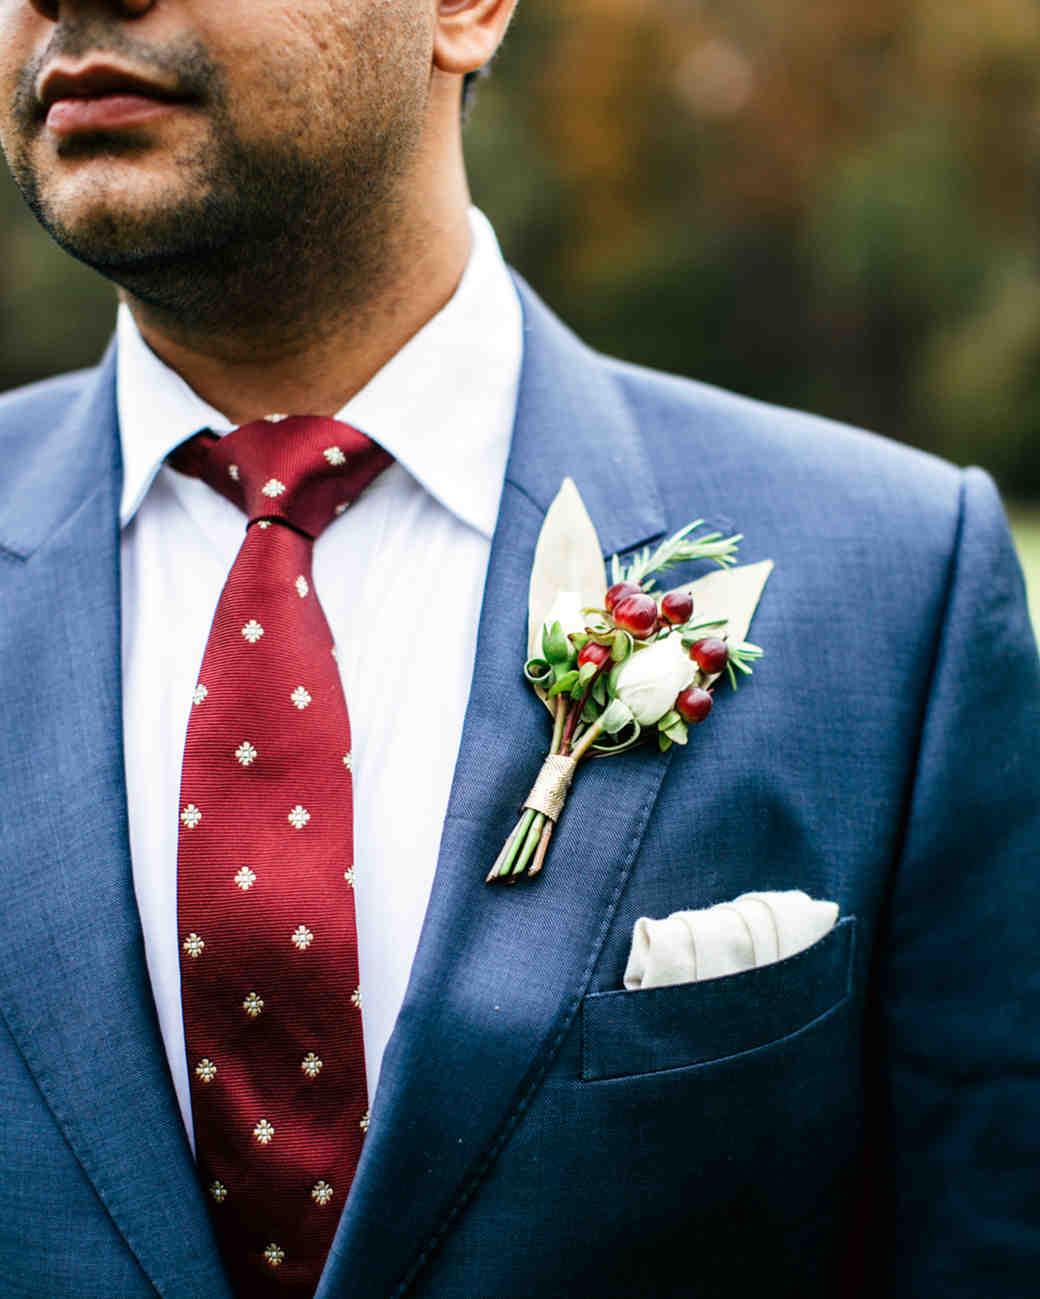 thea-rachit-wedding-boutonniere-0131-s112016-0715.jpg